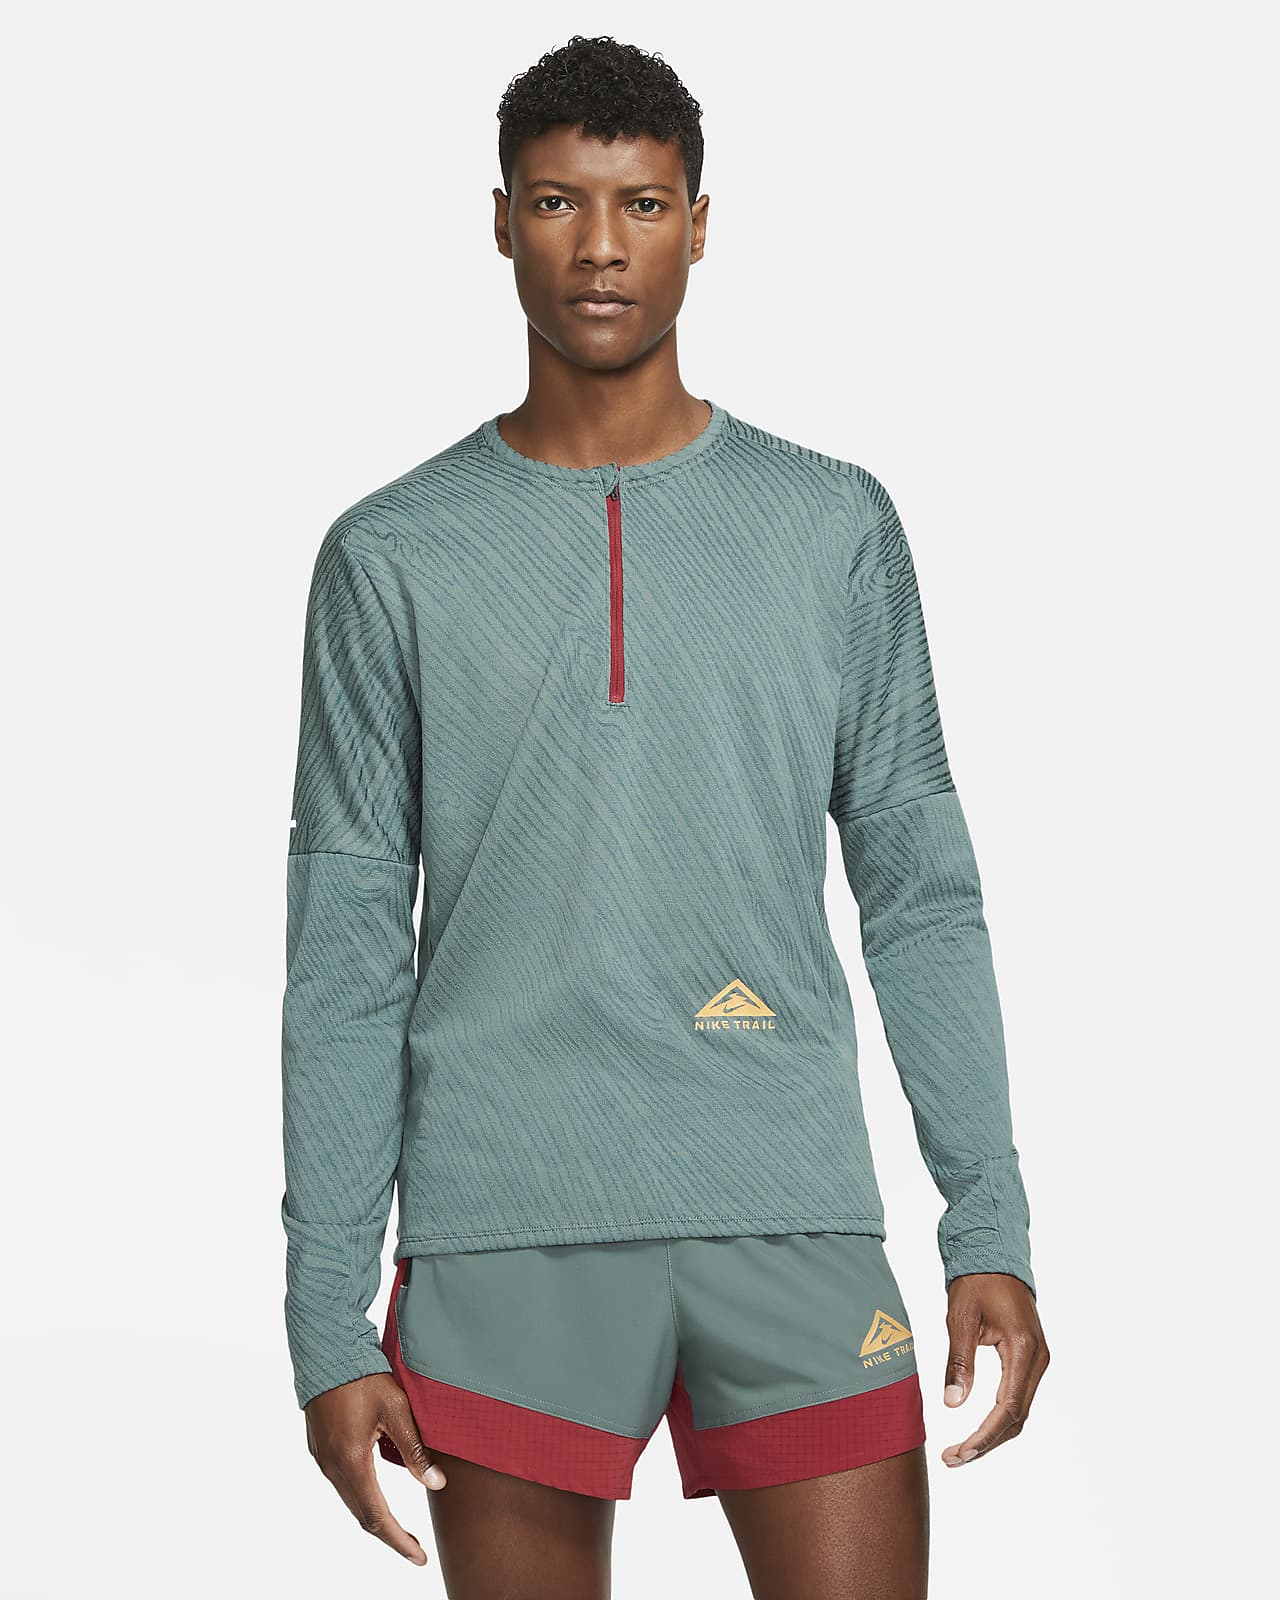 Camiseta de trail running con medio cierre para hombre Nike Dri-FIT Element